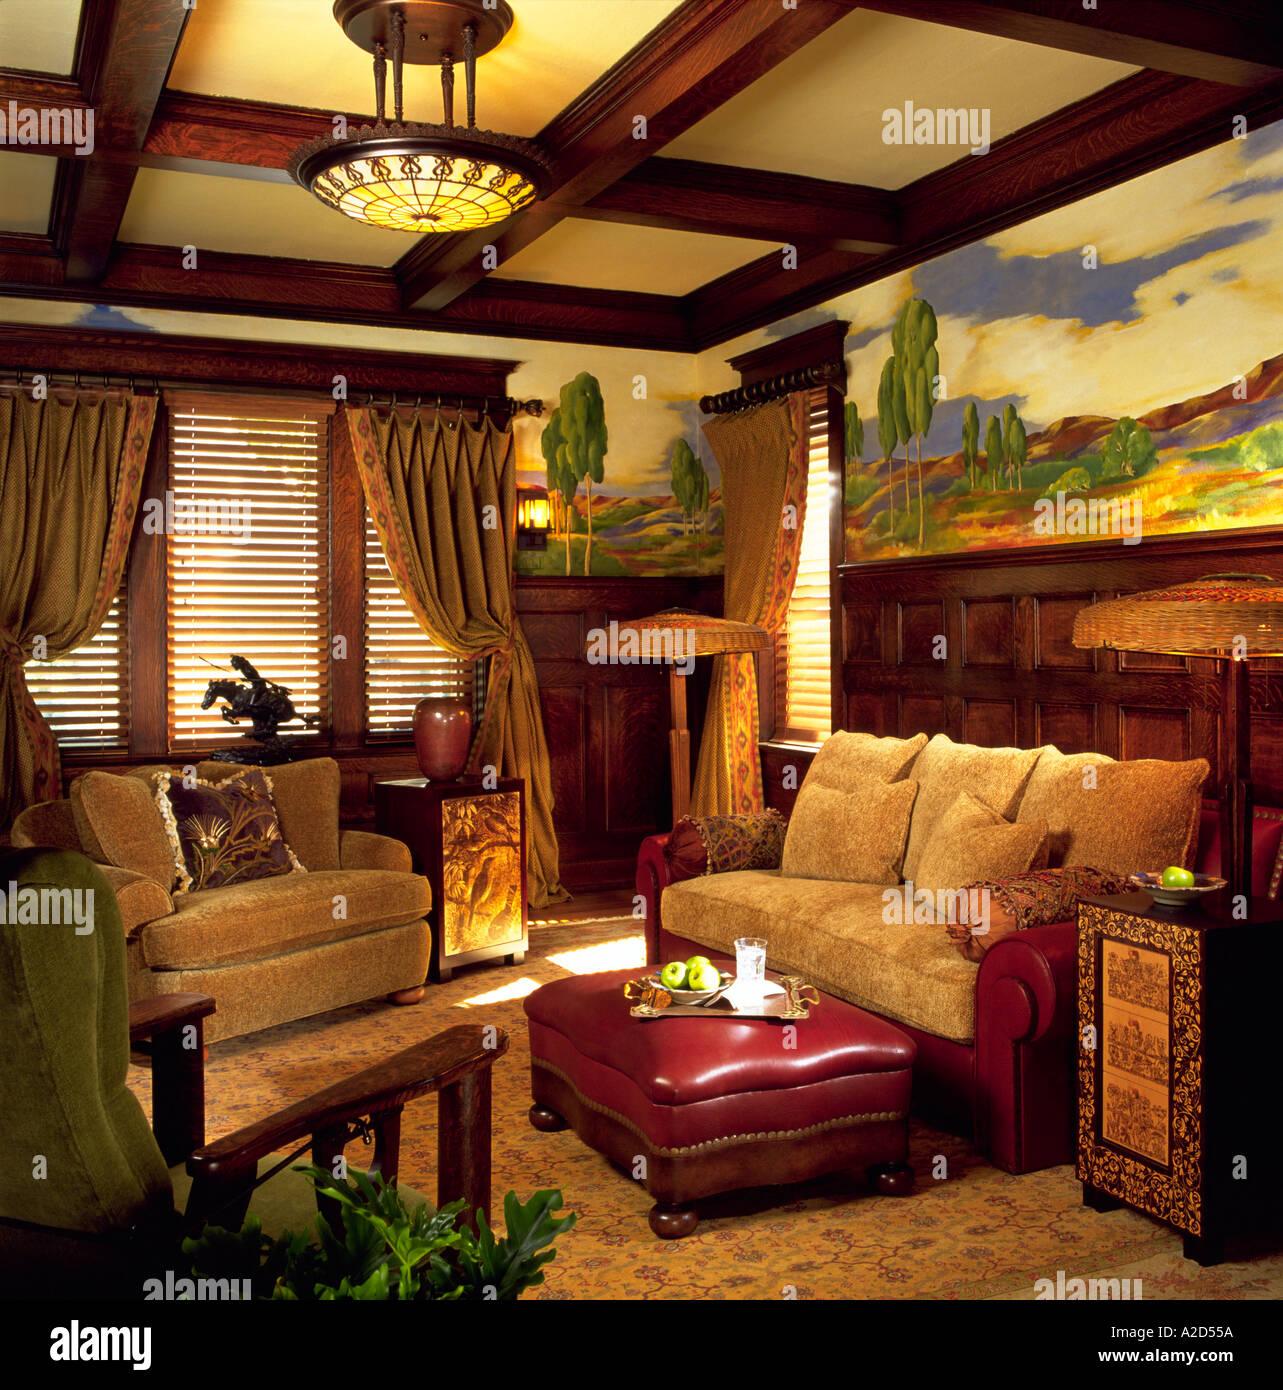 Arts Crafts Living Room Stock Photo Alamy,Diy Kids Small Bedroom Ideas